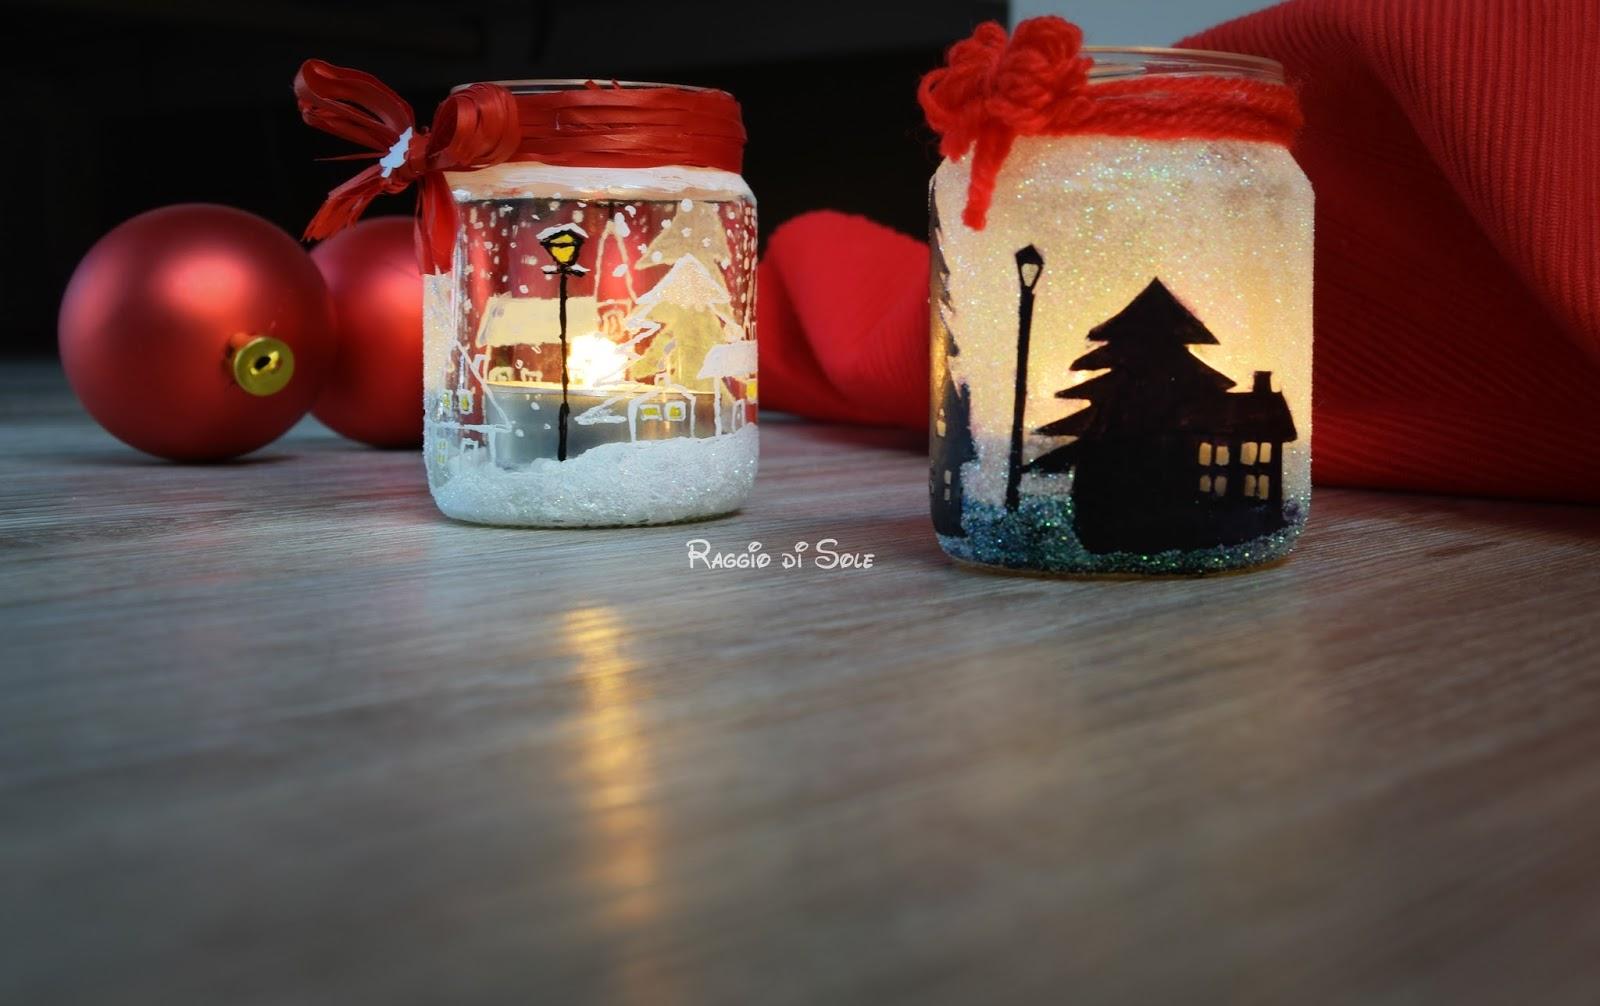 Porta candele homemade raggio di sole - Portacandele di natale fai da te ...